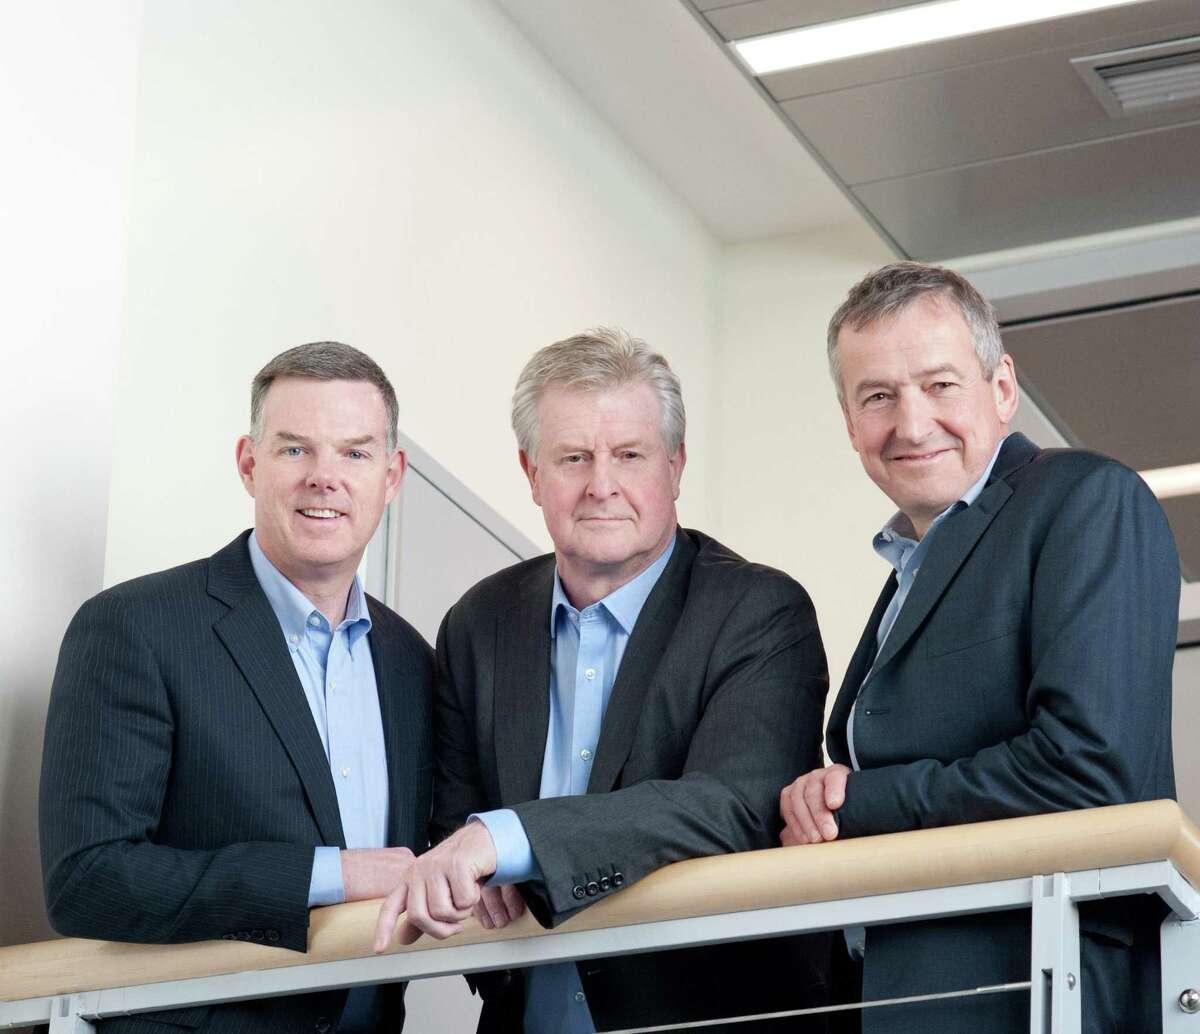 RallyBio co-founders Jeffrey Fryer, Martin Mackay and Stephen Uden